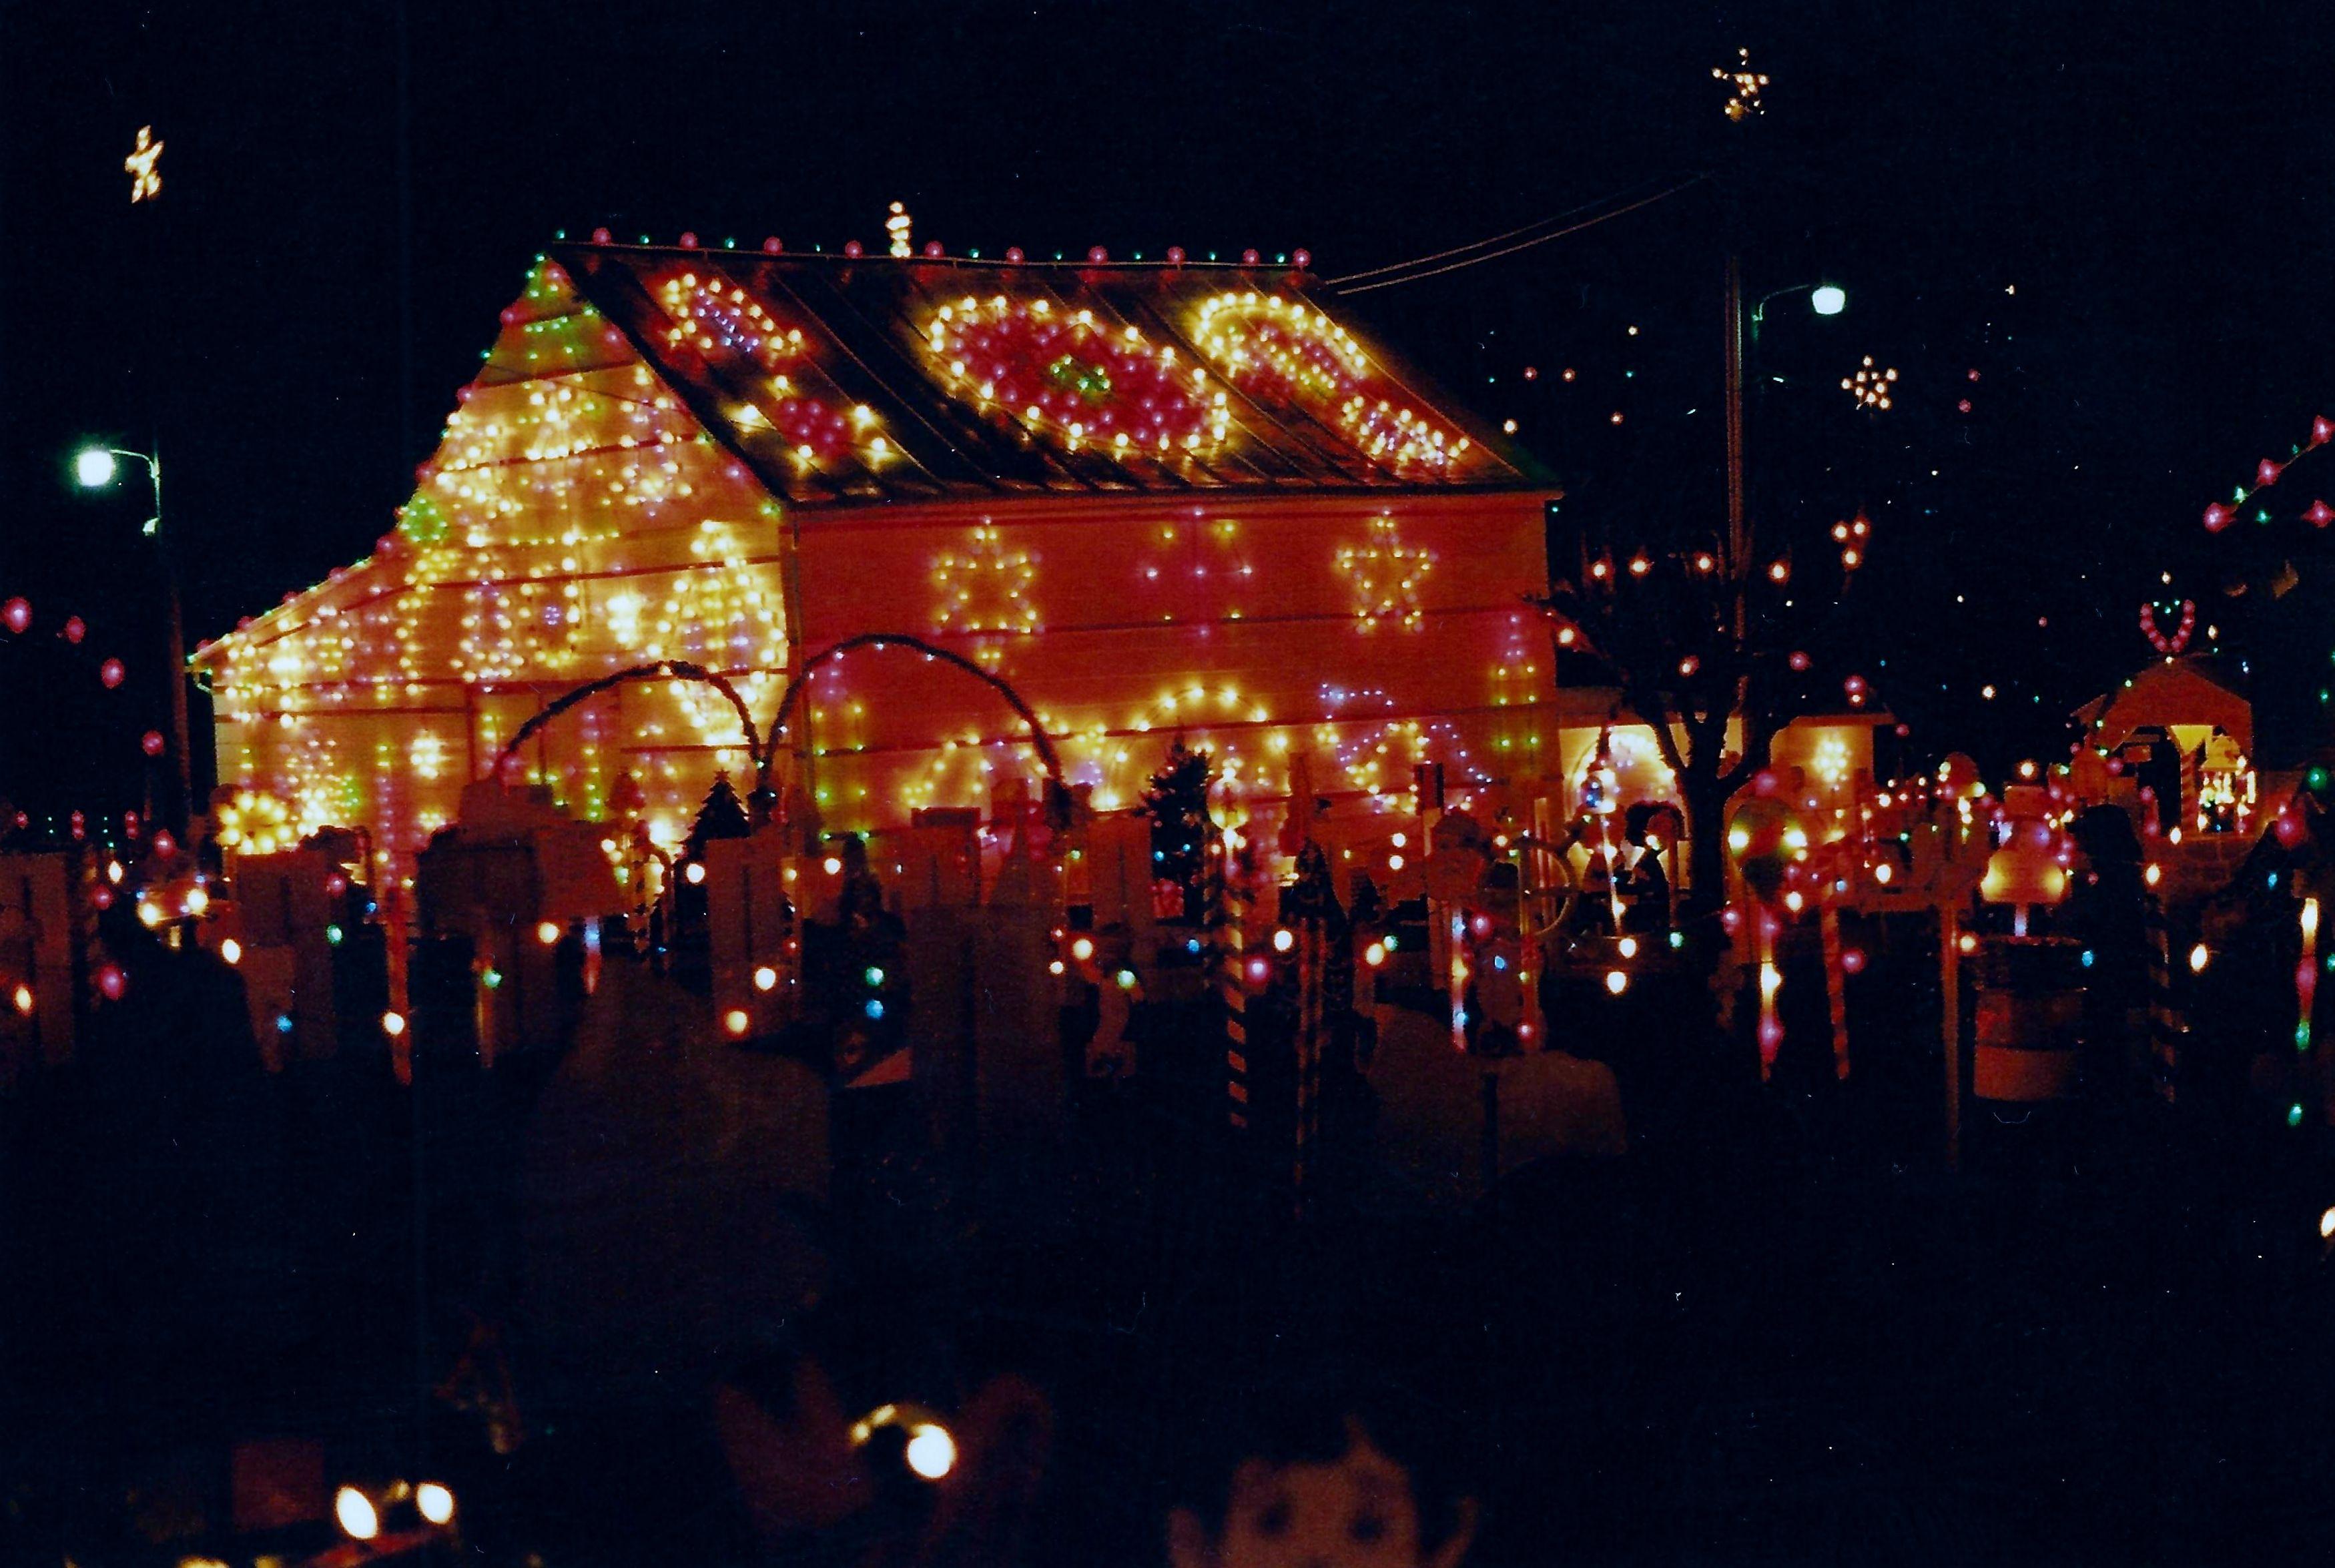 koziars christmas village 782 christmas village rd bernville pa 19506 - Bernville Christmas Village